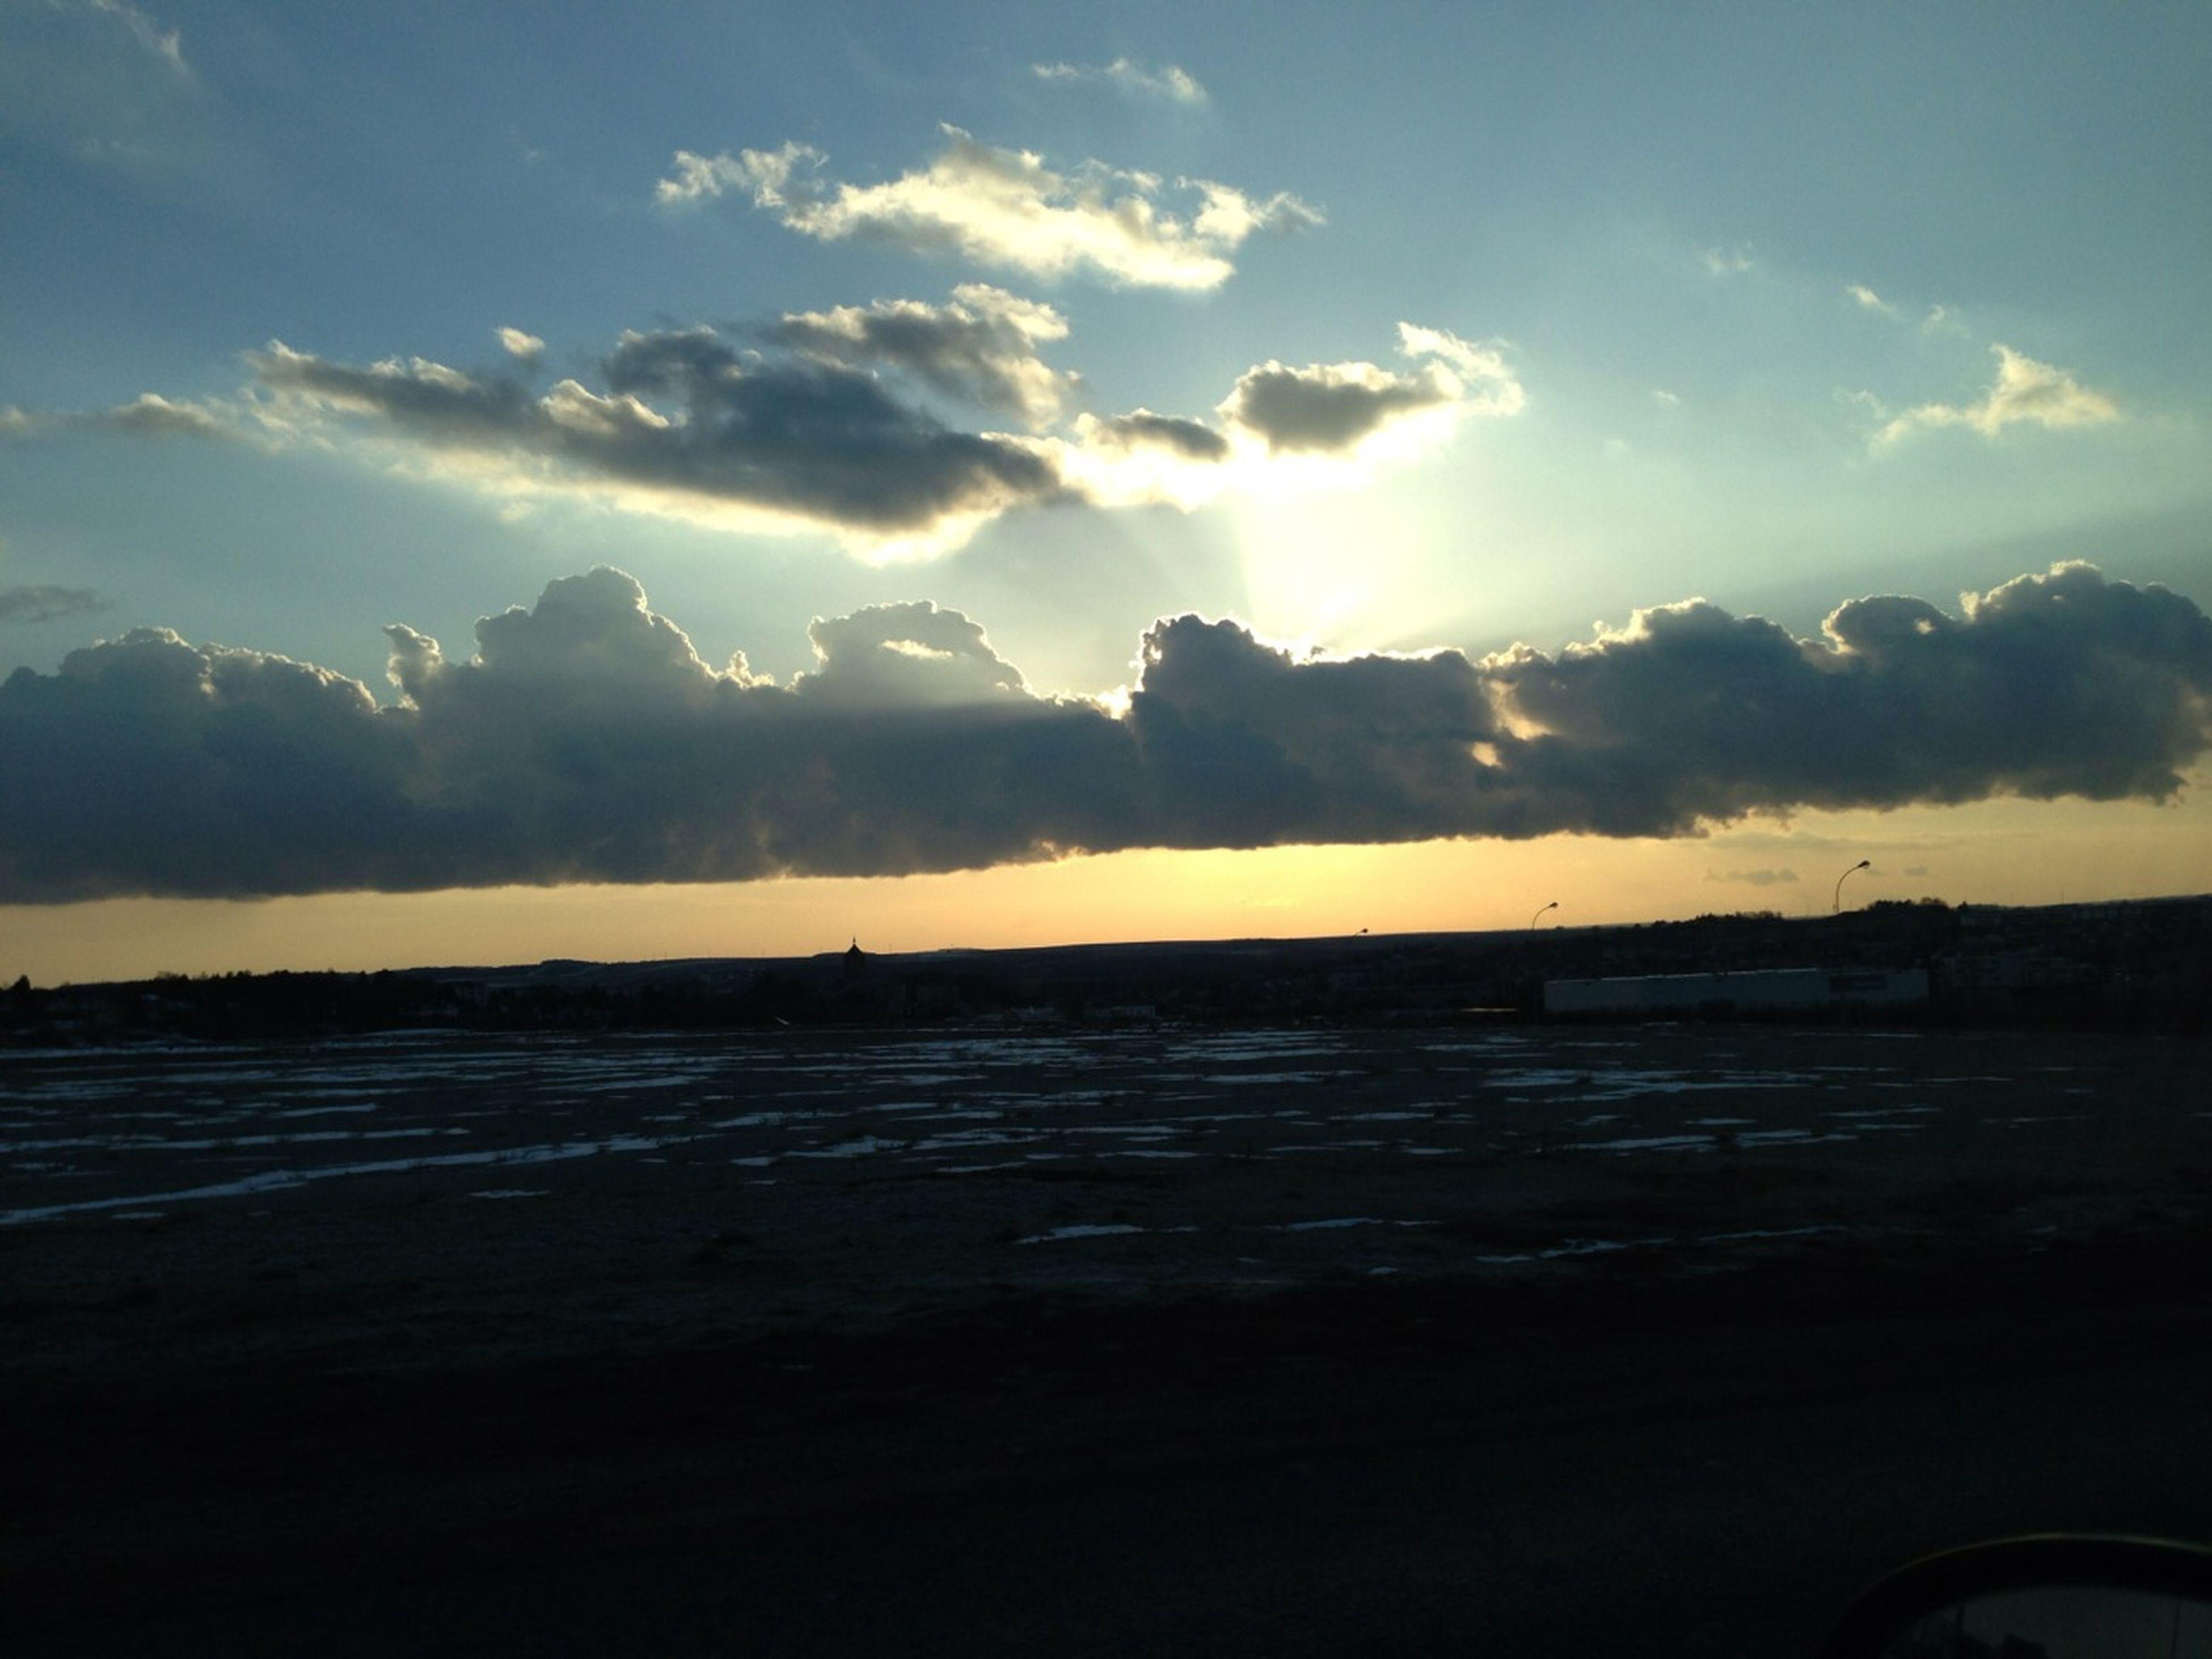 sky, water, sunset, scenics, beauty in nature, tranquil scene, tranquility, cloud - sky, mountain, sea, nature, idyllic, lake, silhouette, sunlight, sun, reflection, cloud, transportation, mode of transport